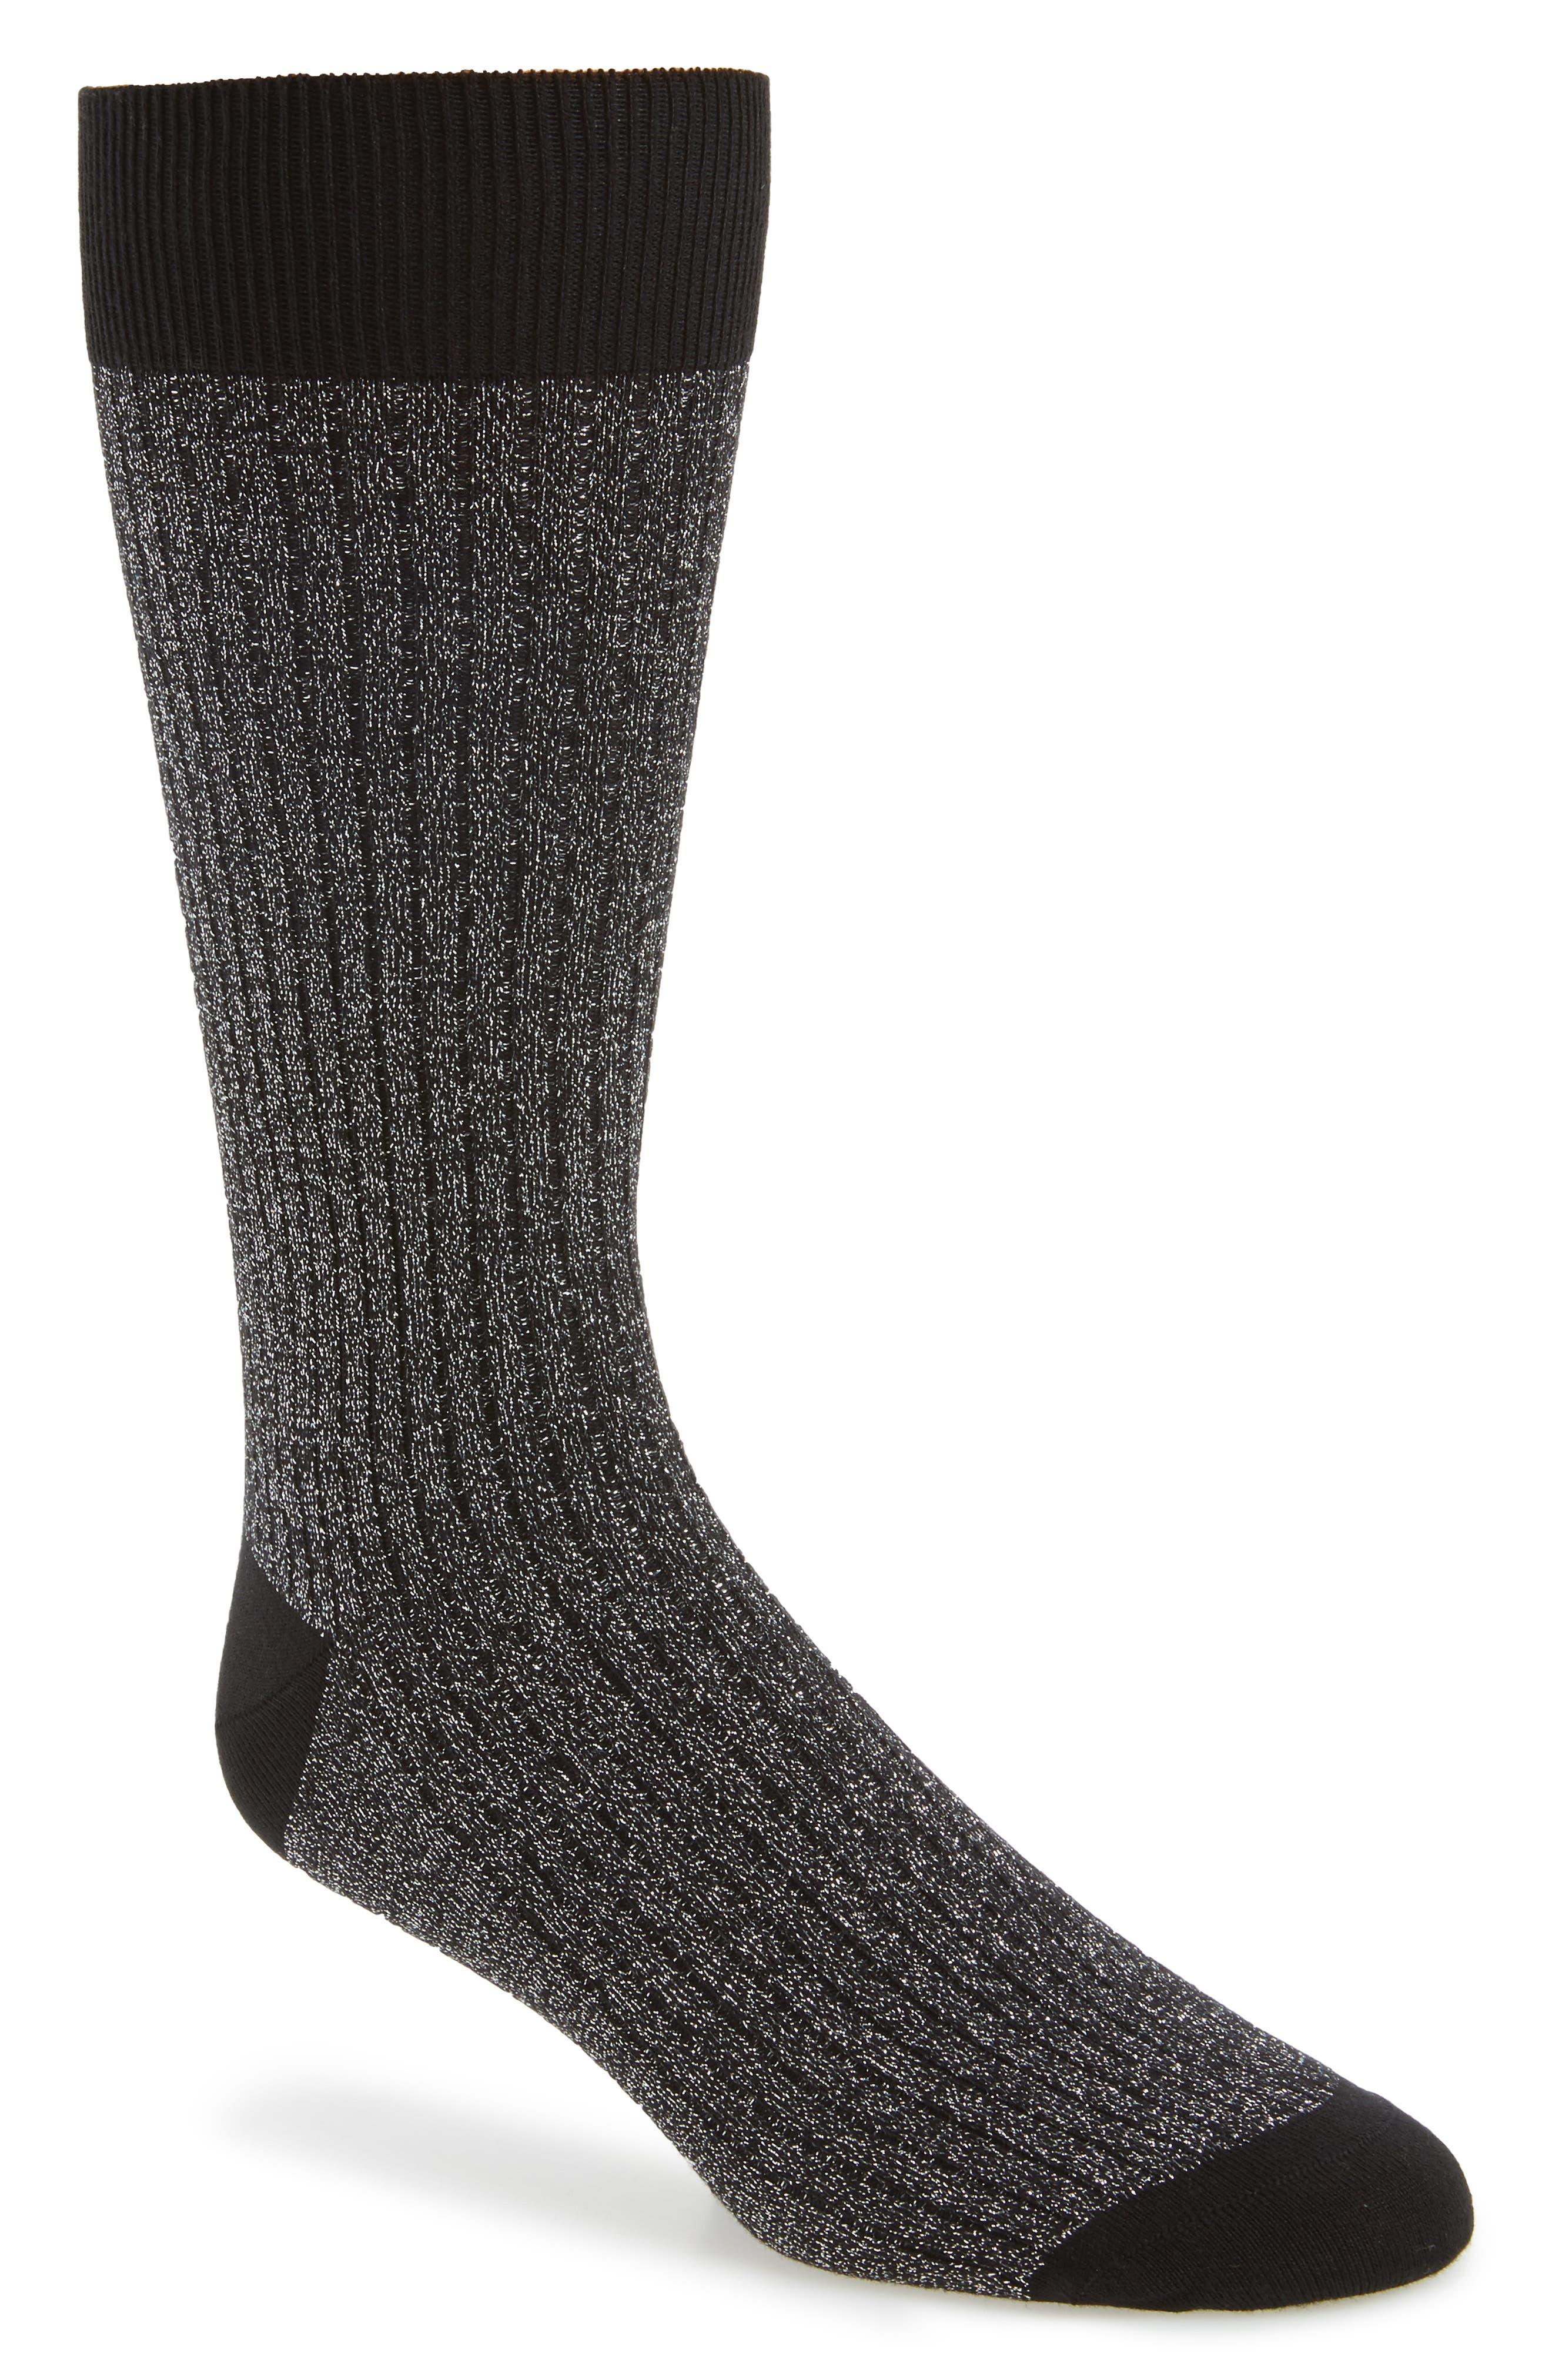 Sparkle Socks,                         Main,                         color, Black